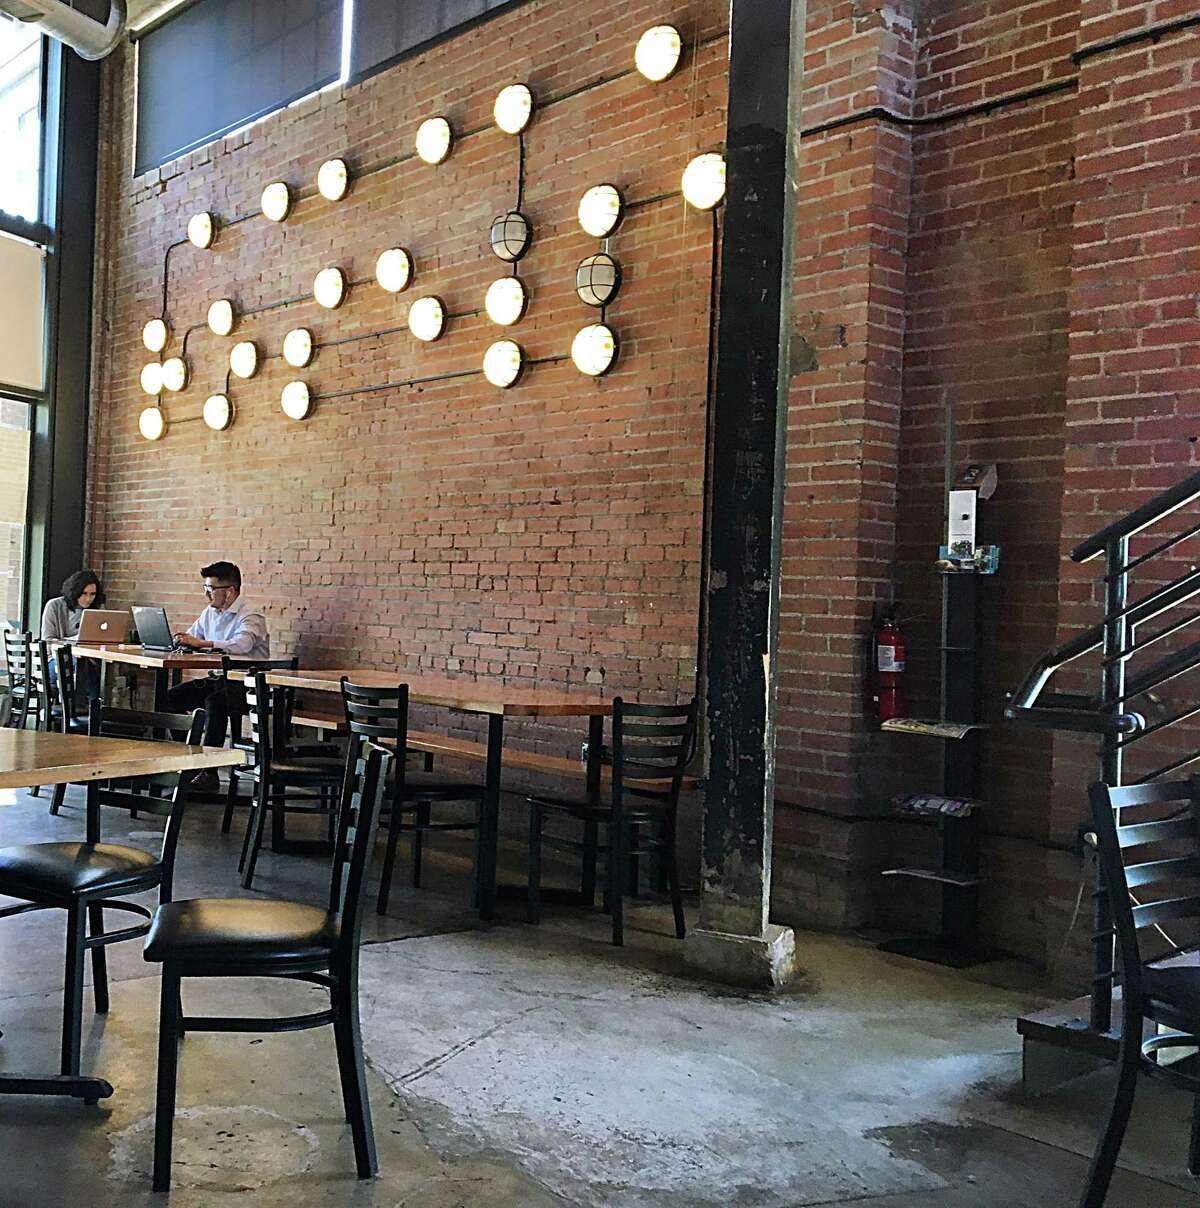 Contemporary R&B artist and San Antonian Xavier Omär recently held his NPR Tiny Desk Concert at a Rosella Coffee Co.